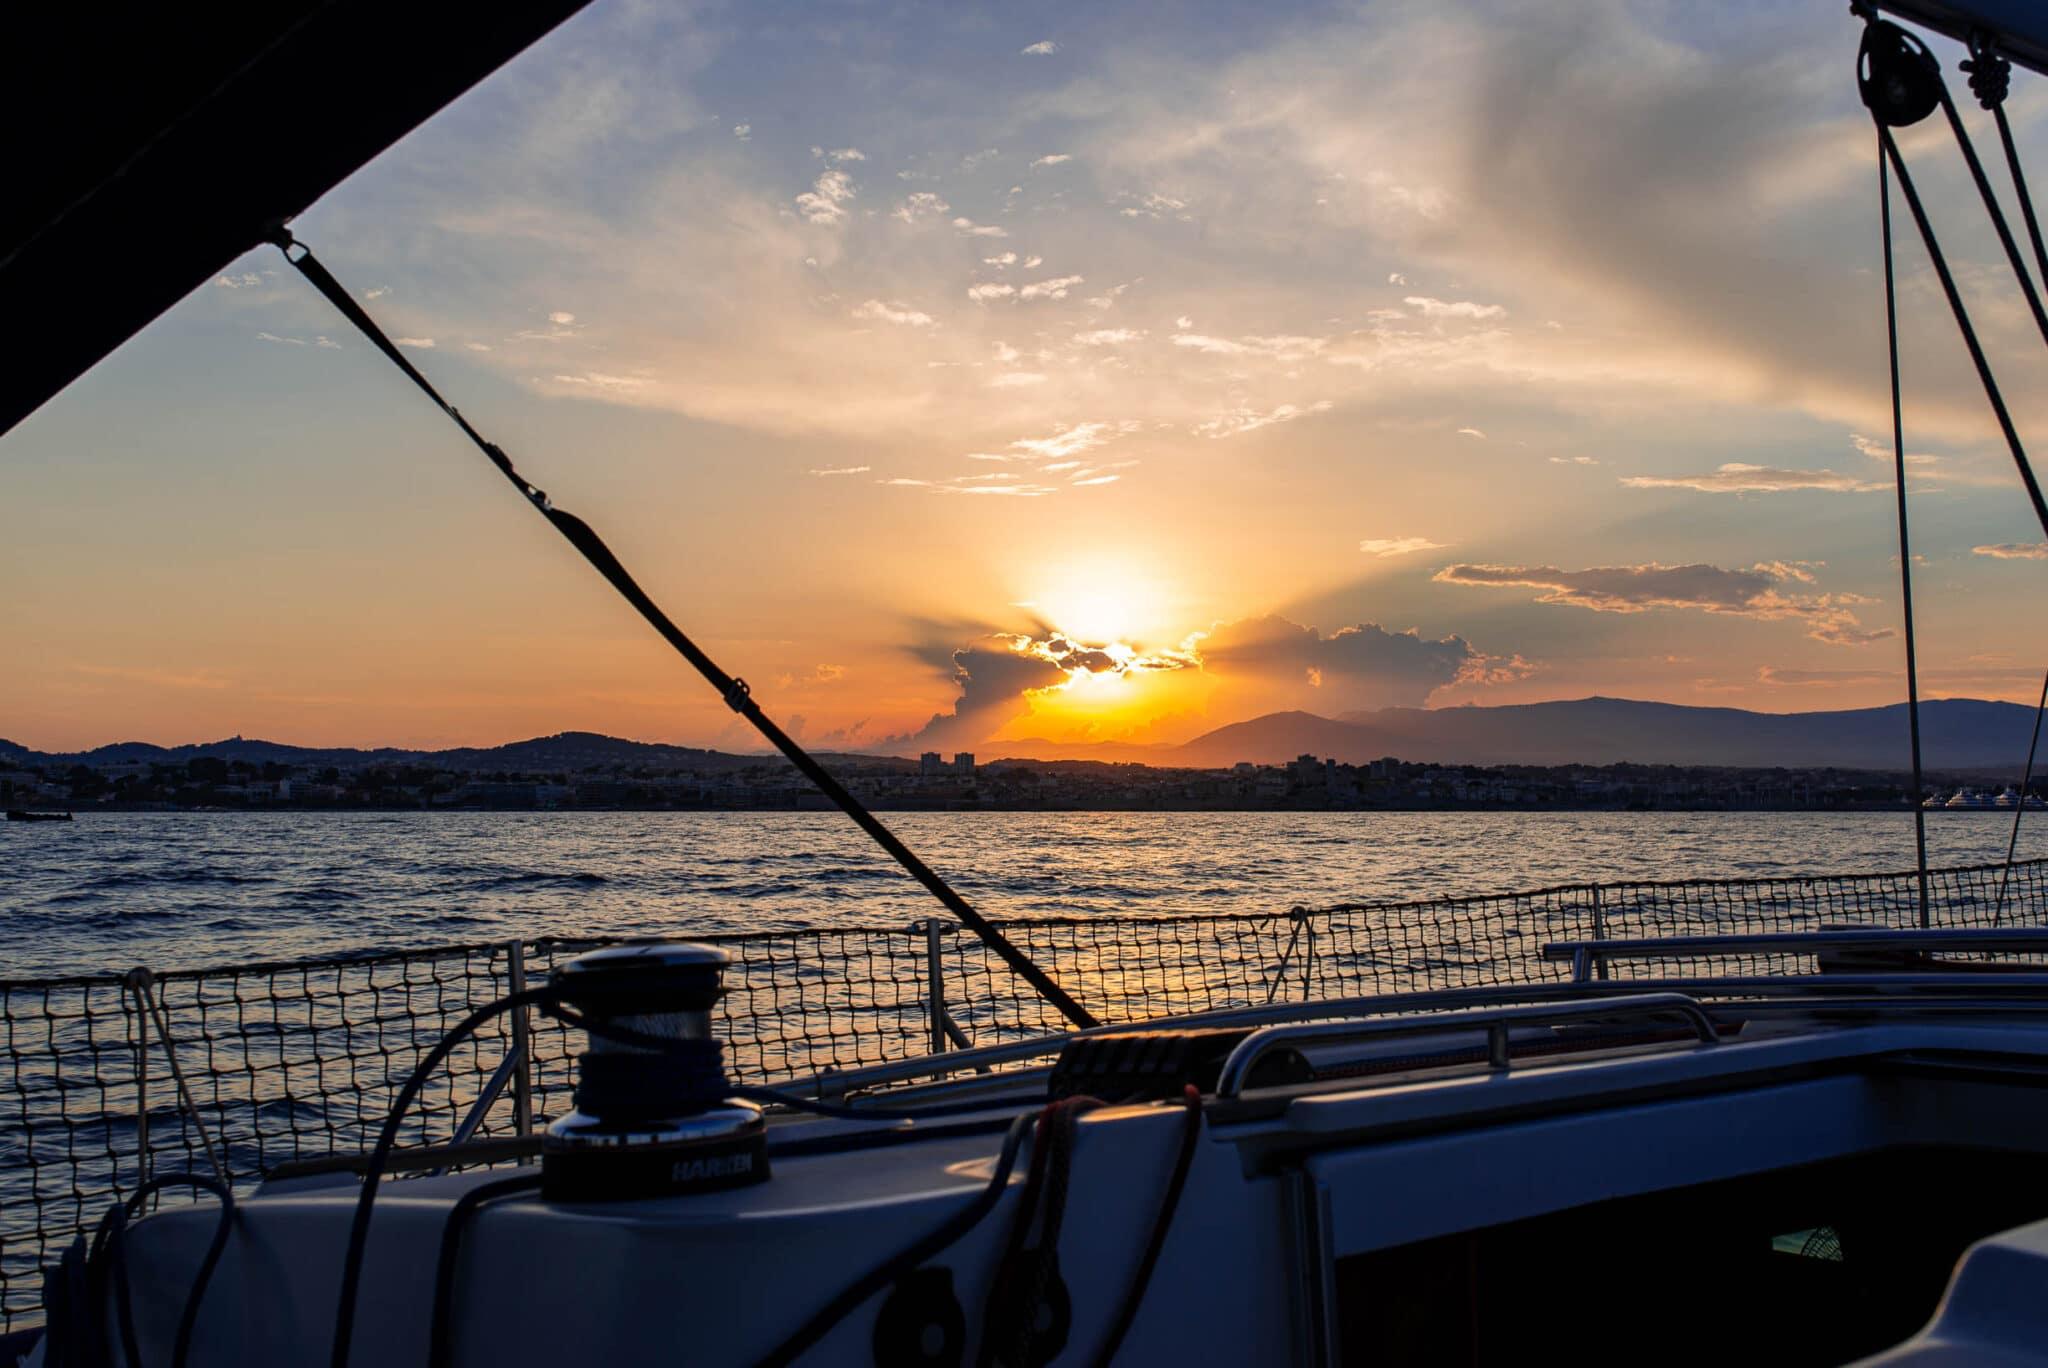 Sunset on Antibes